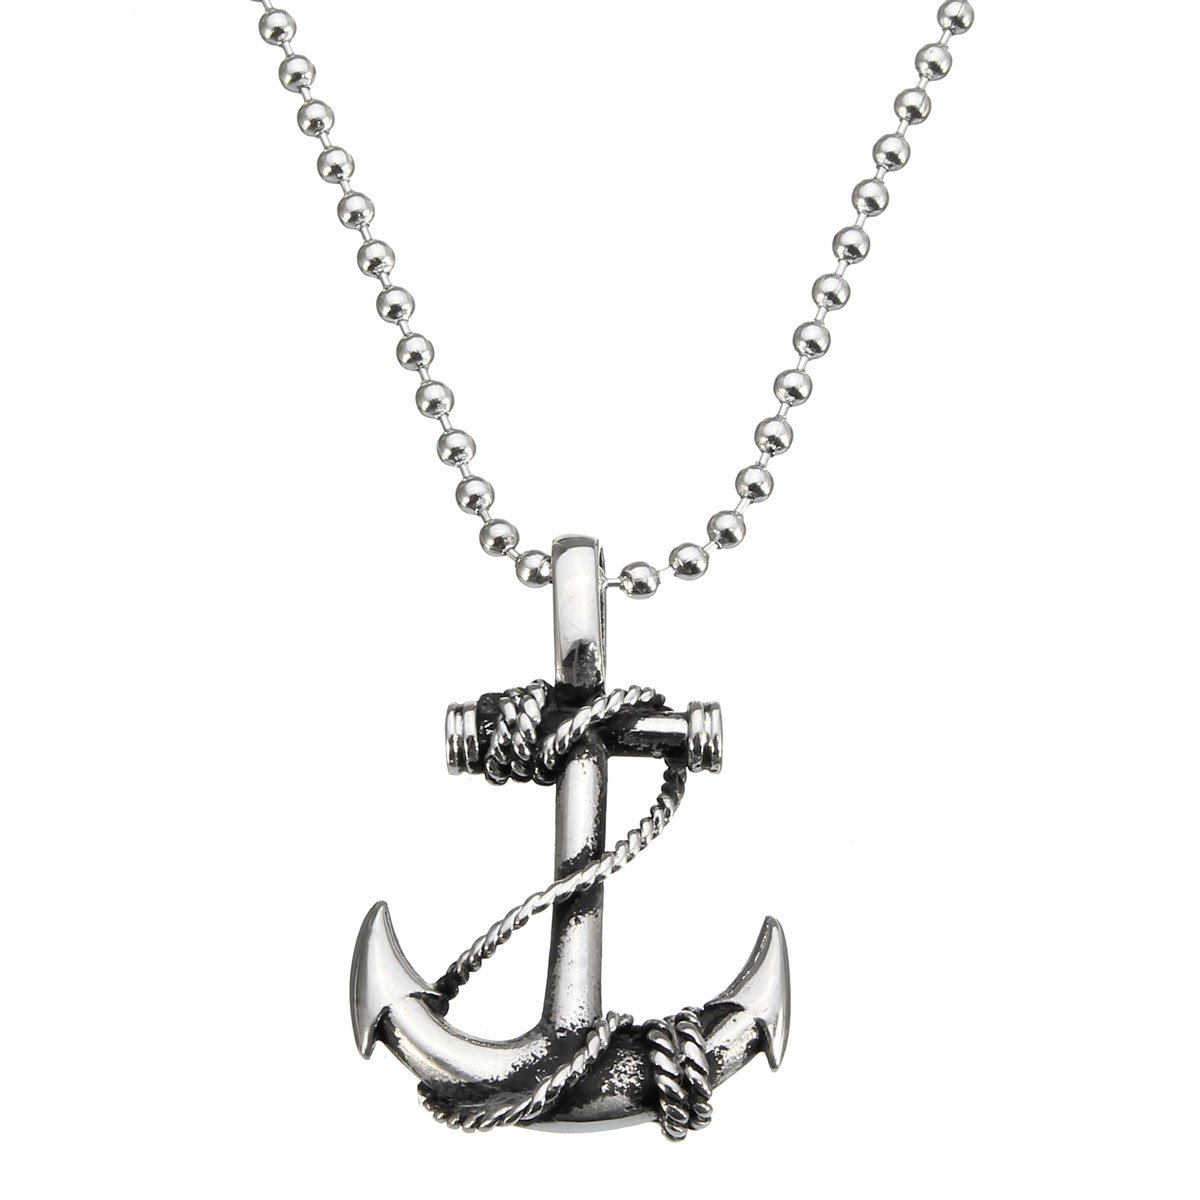 Vintage Stainless Steel Boat Anchor Pendant Men Silver